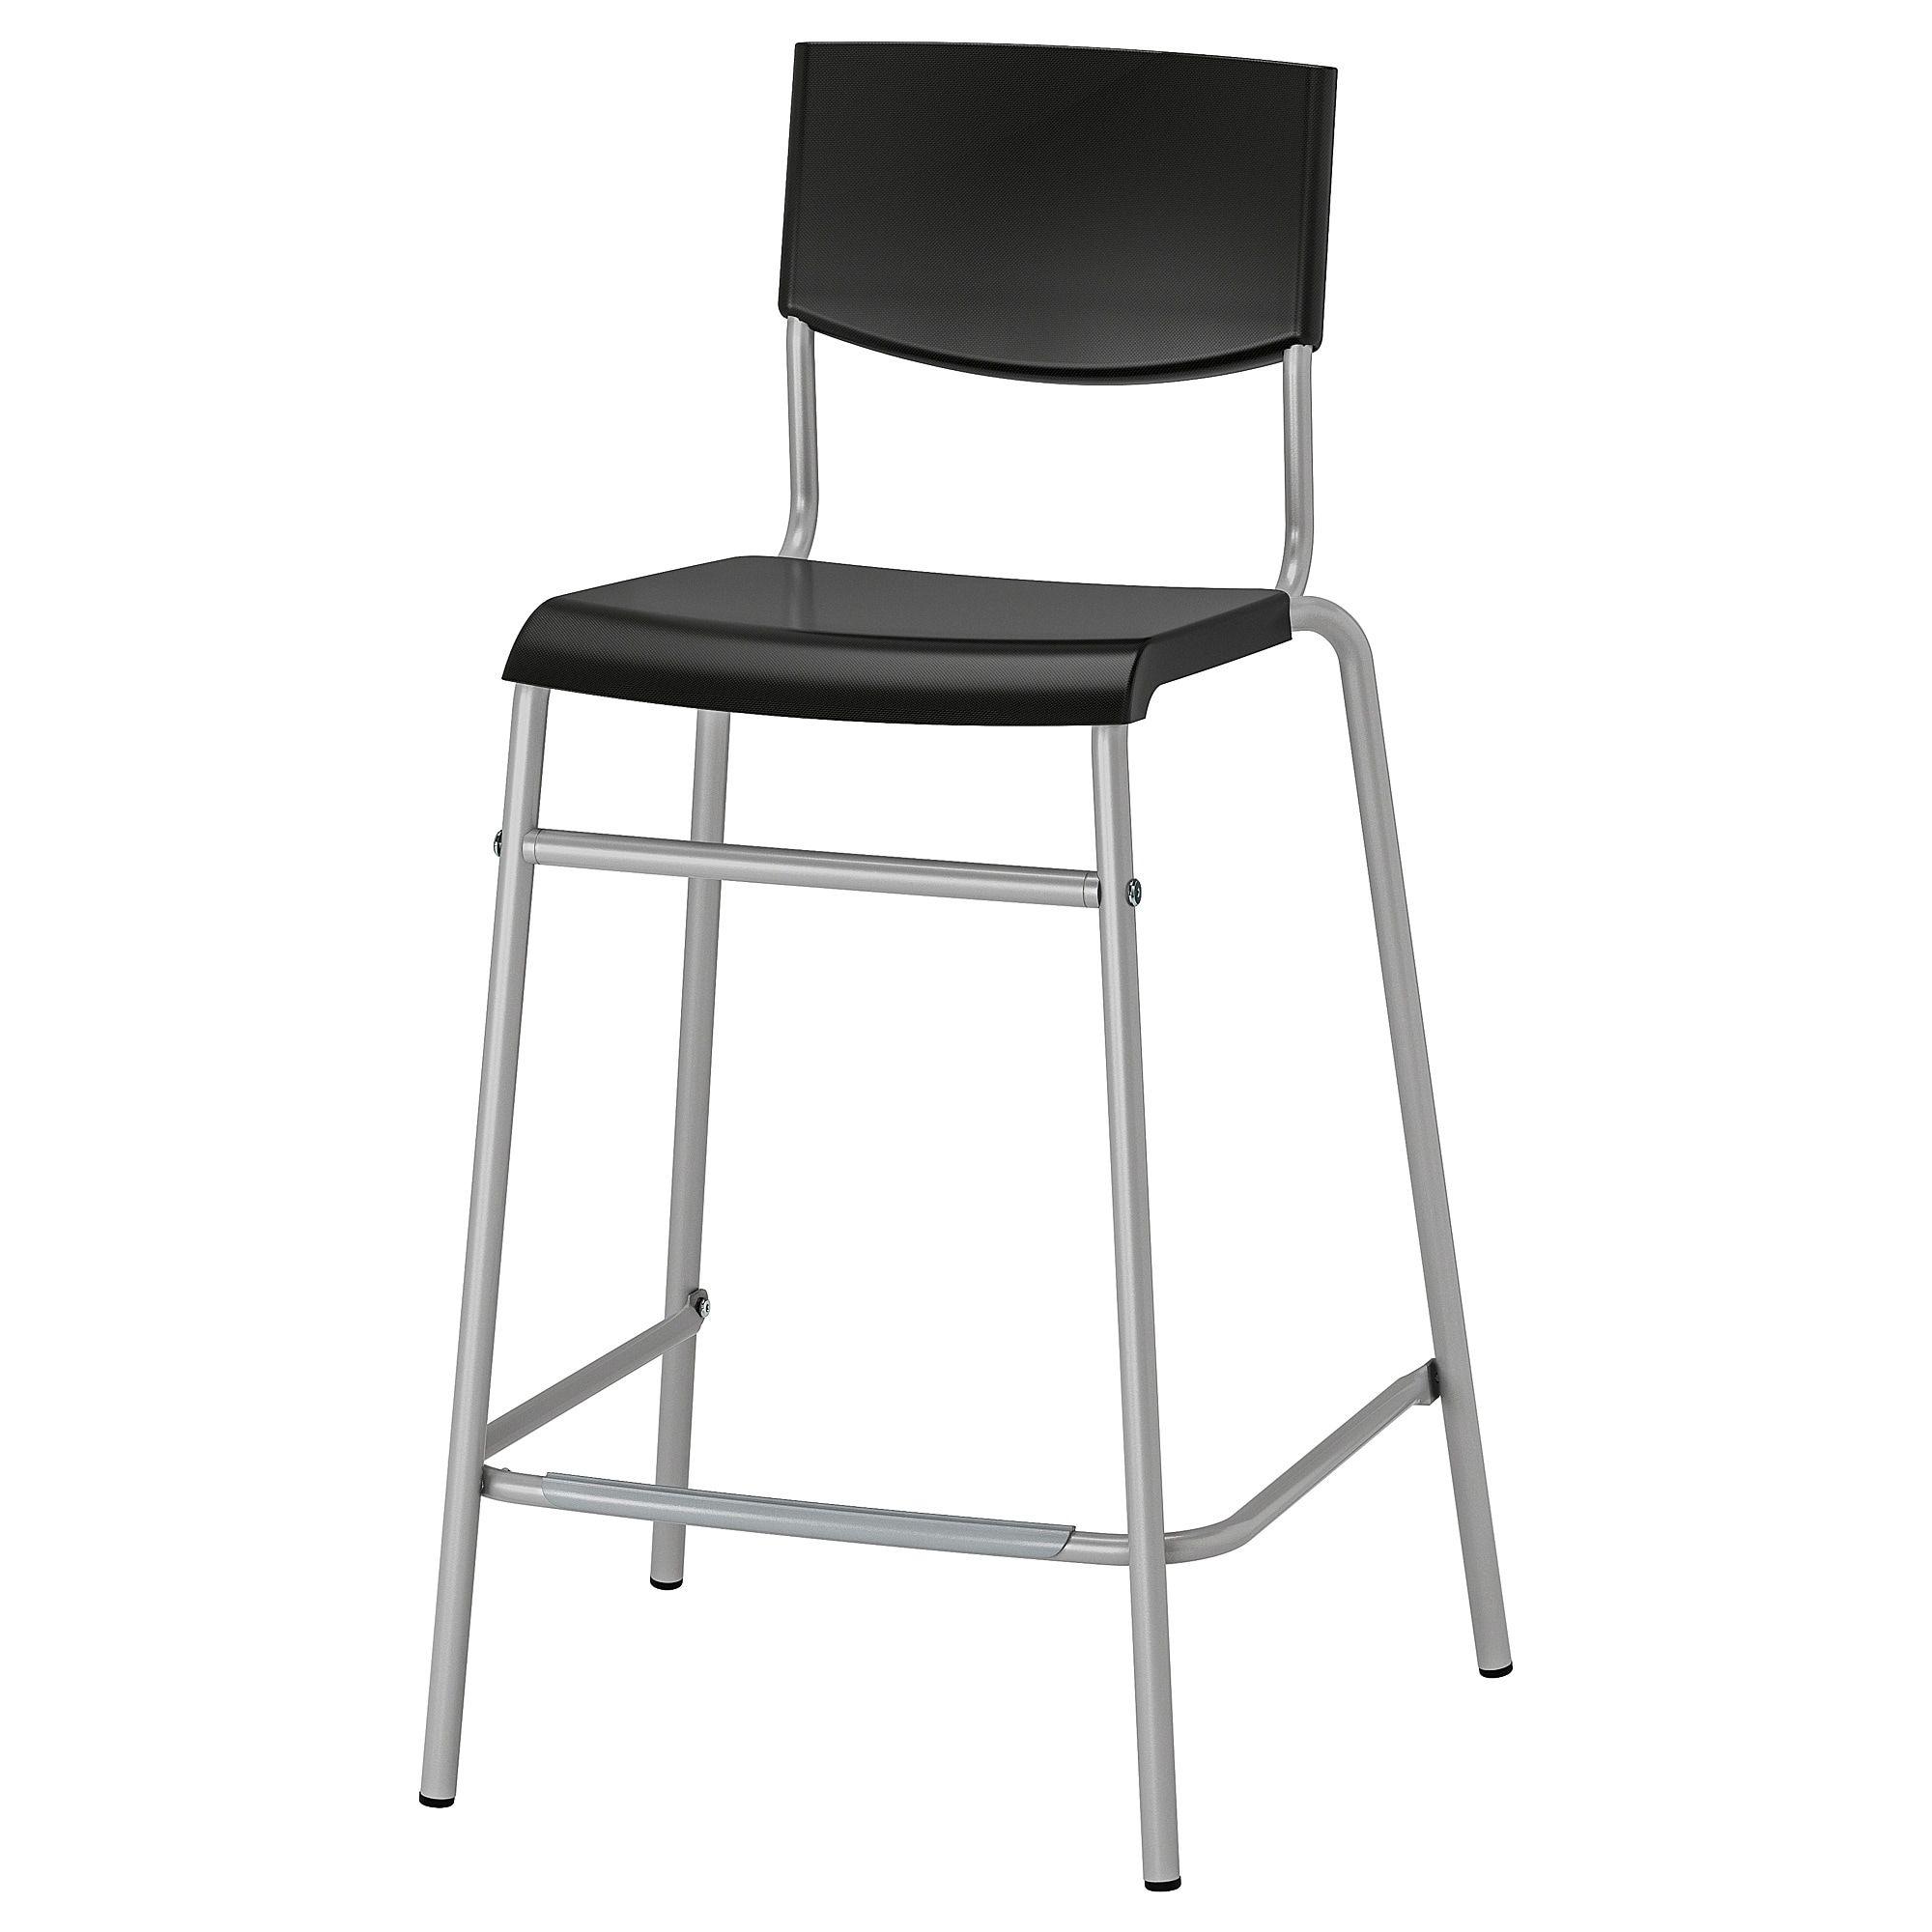 Stig Bar Stool With Backrest Black Silver Color 24 3 4 Ikea Bar Stools Modern Bar Stools Kitchen Kitchen Bar Stools